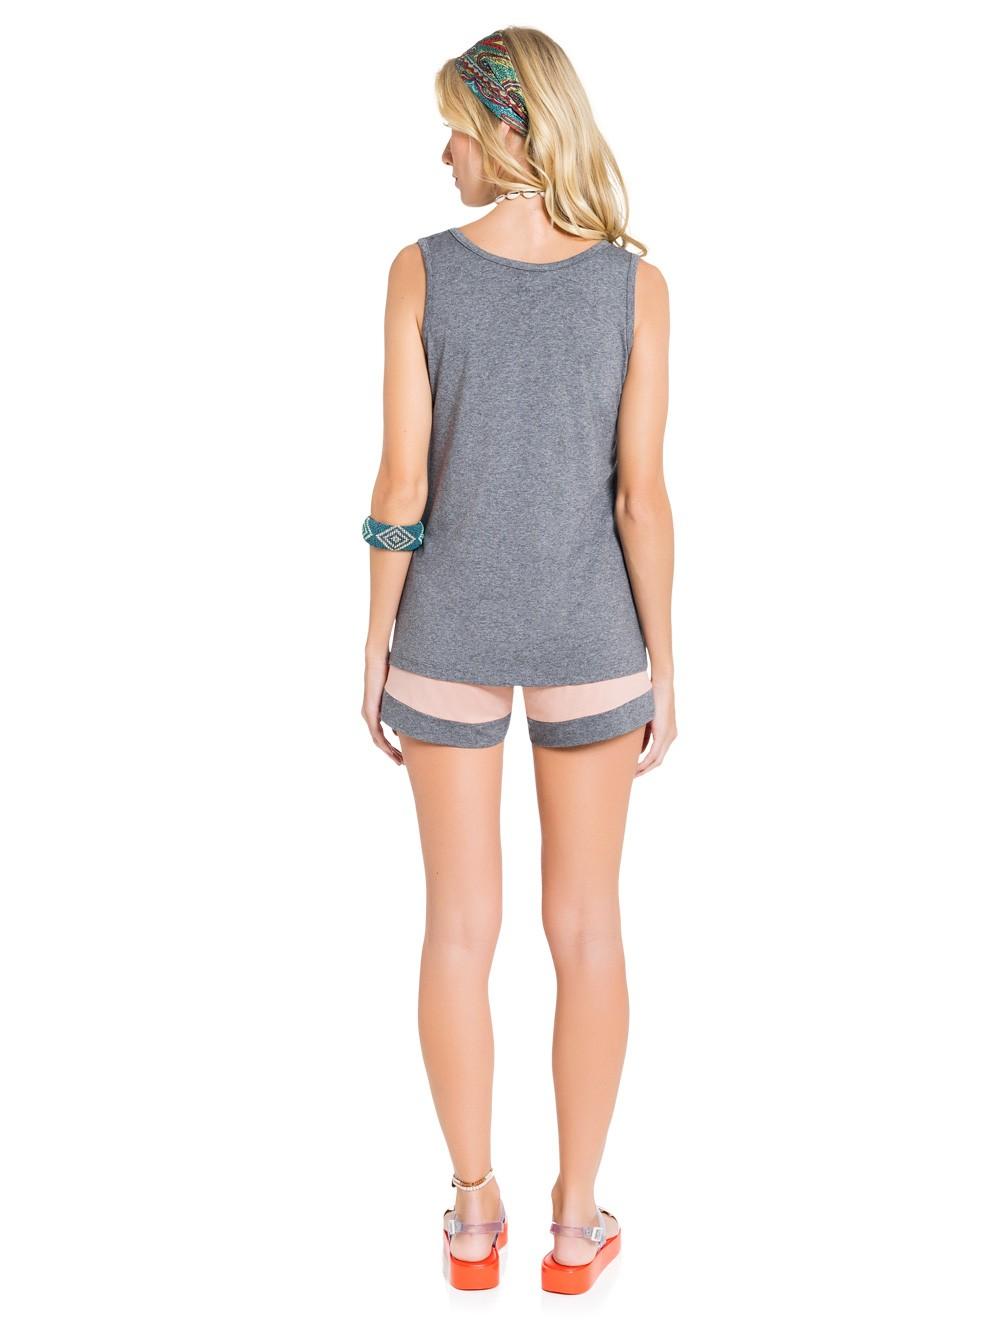 Pijama regata feminino mescla short curtinho rosa viscose